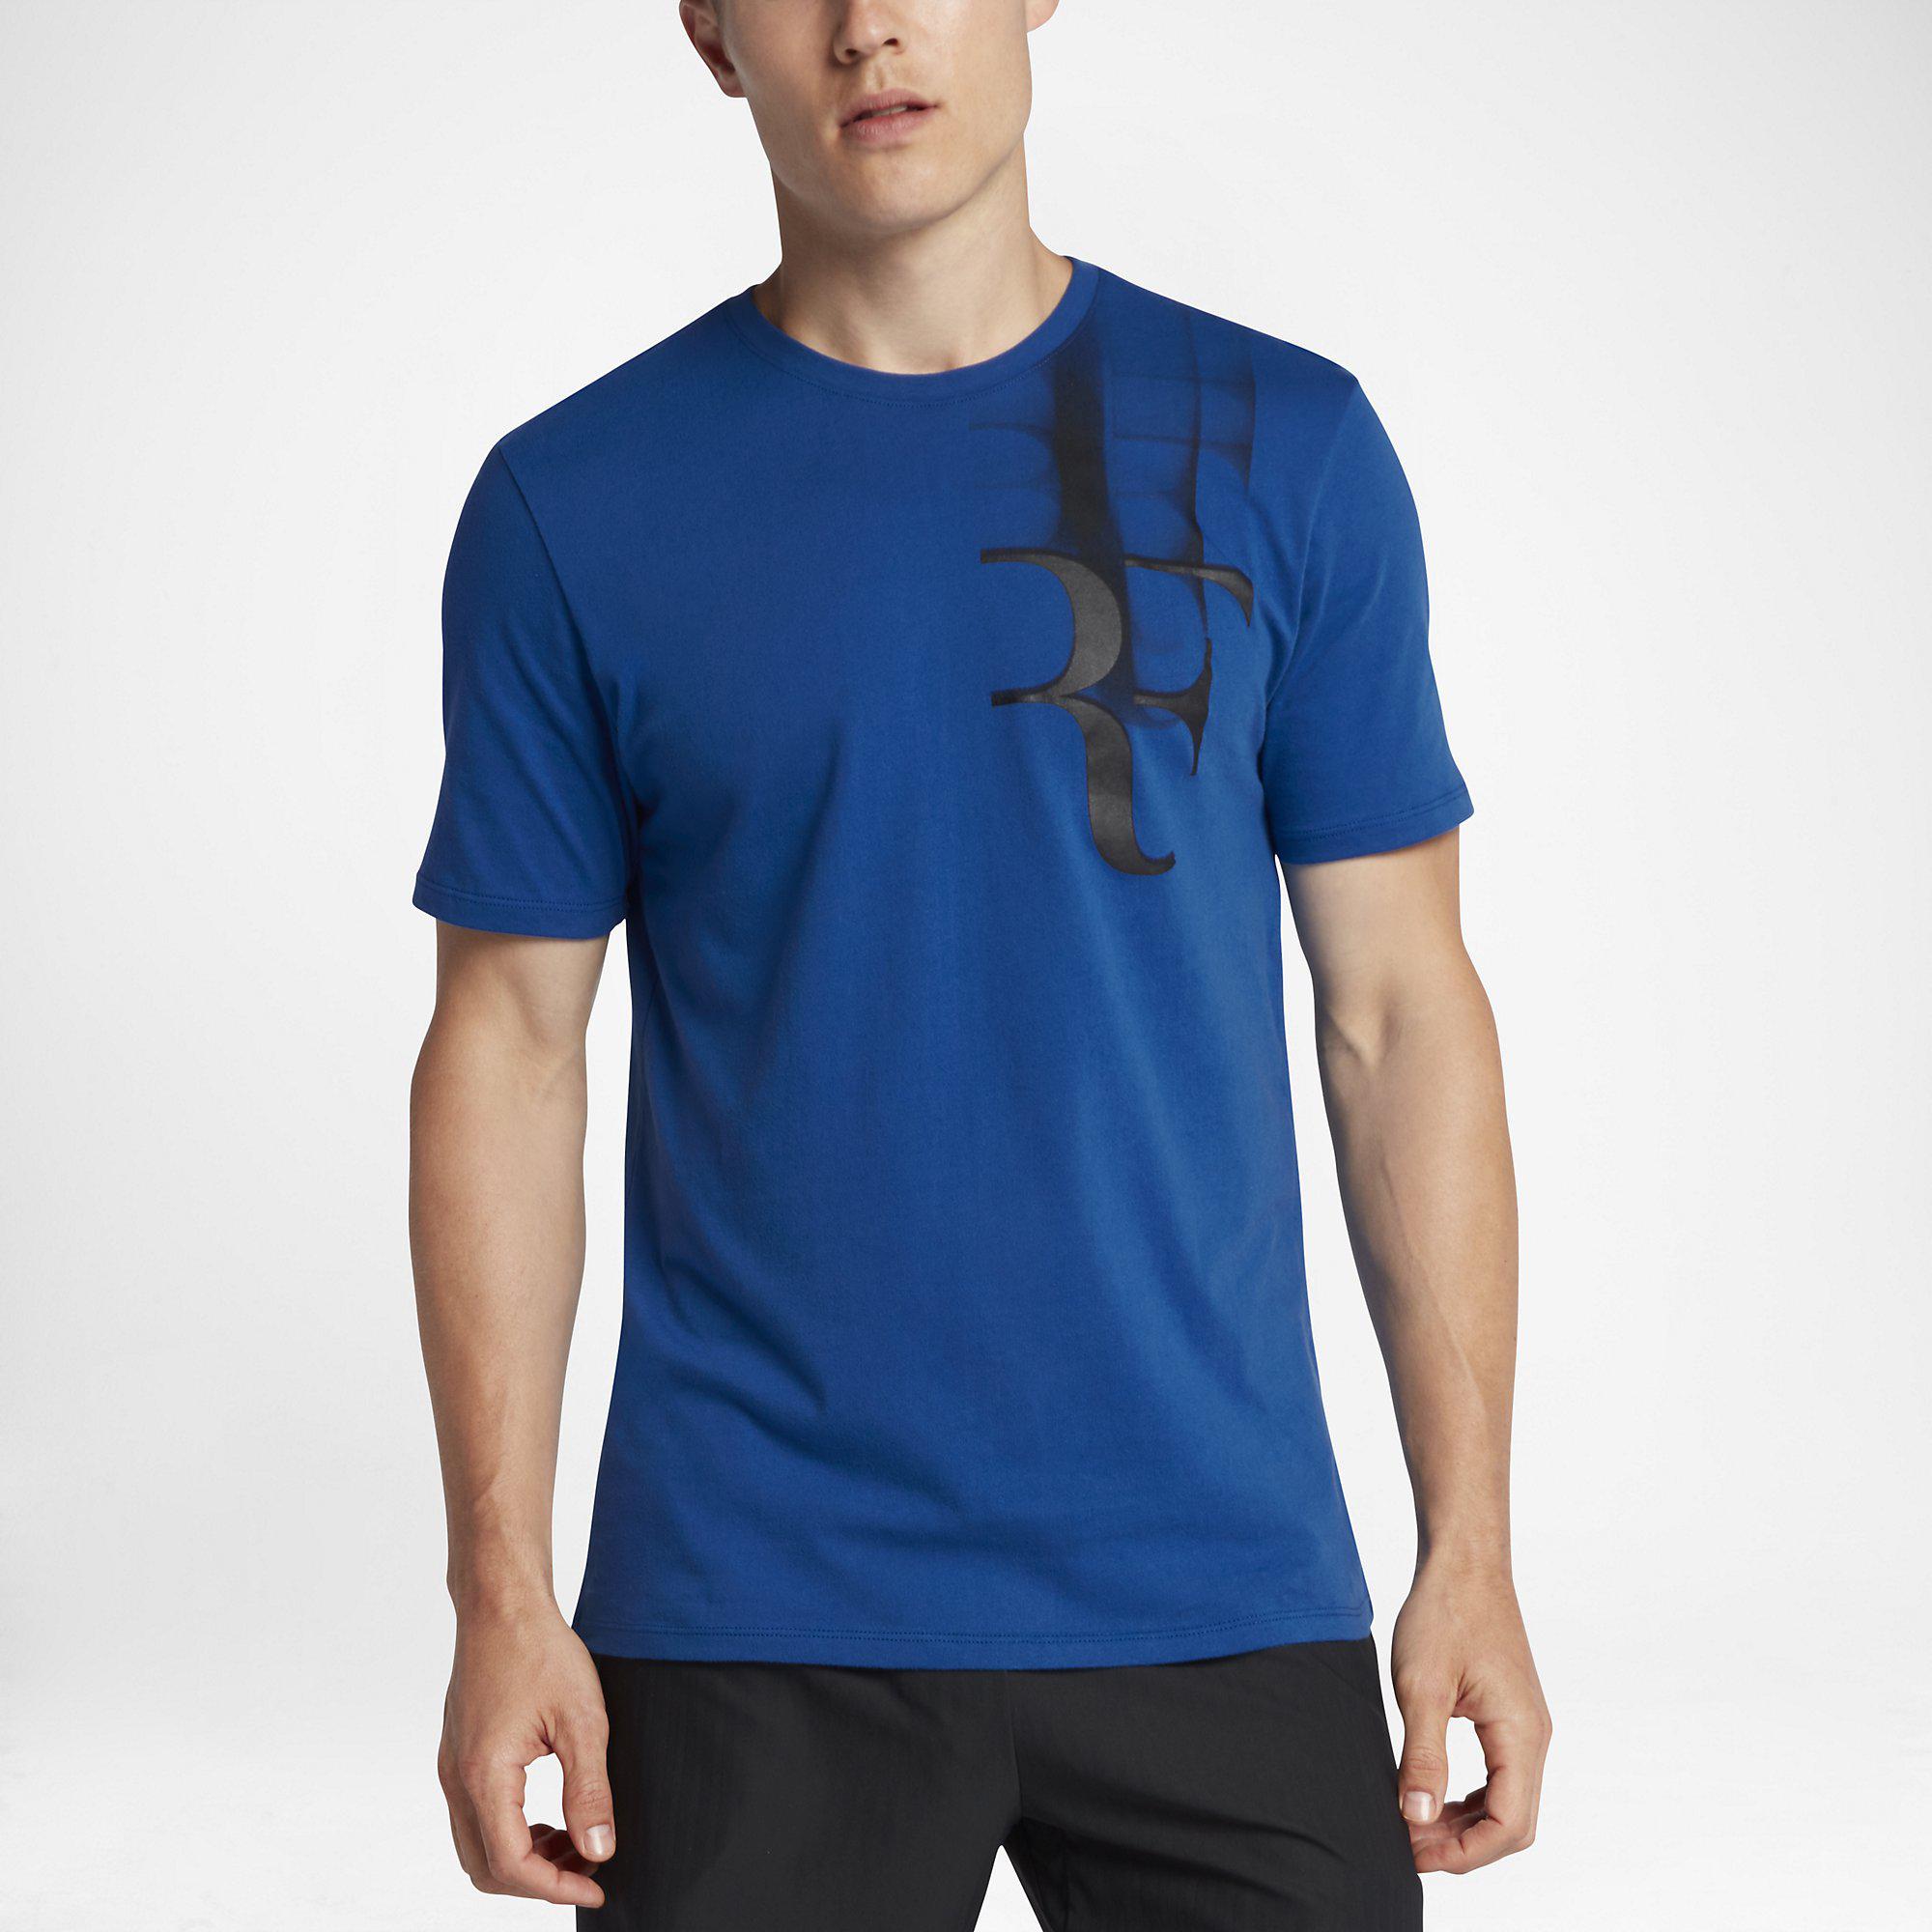 725ac974faf Nike Mens Court Roger Federer Tee - Blue Jay - Tennisnuts.com